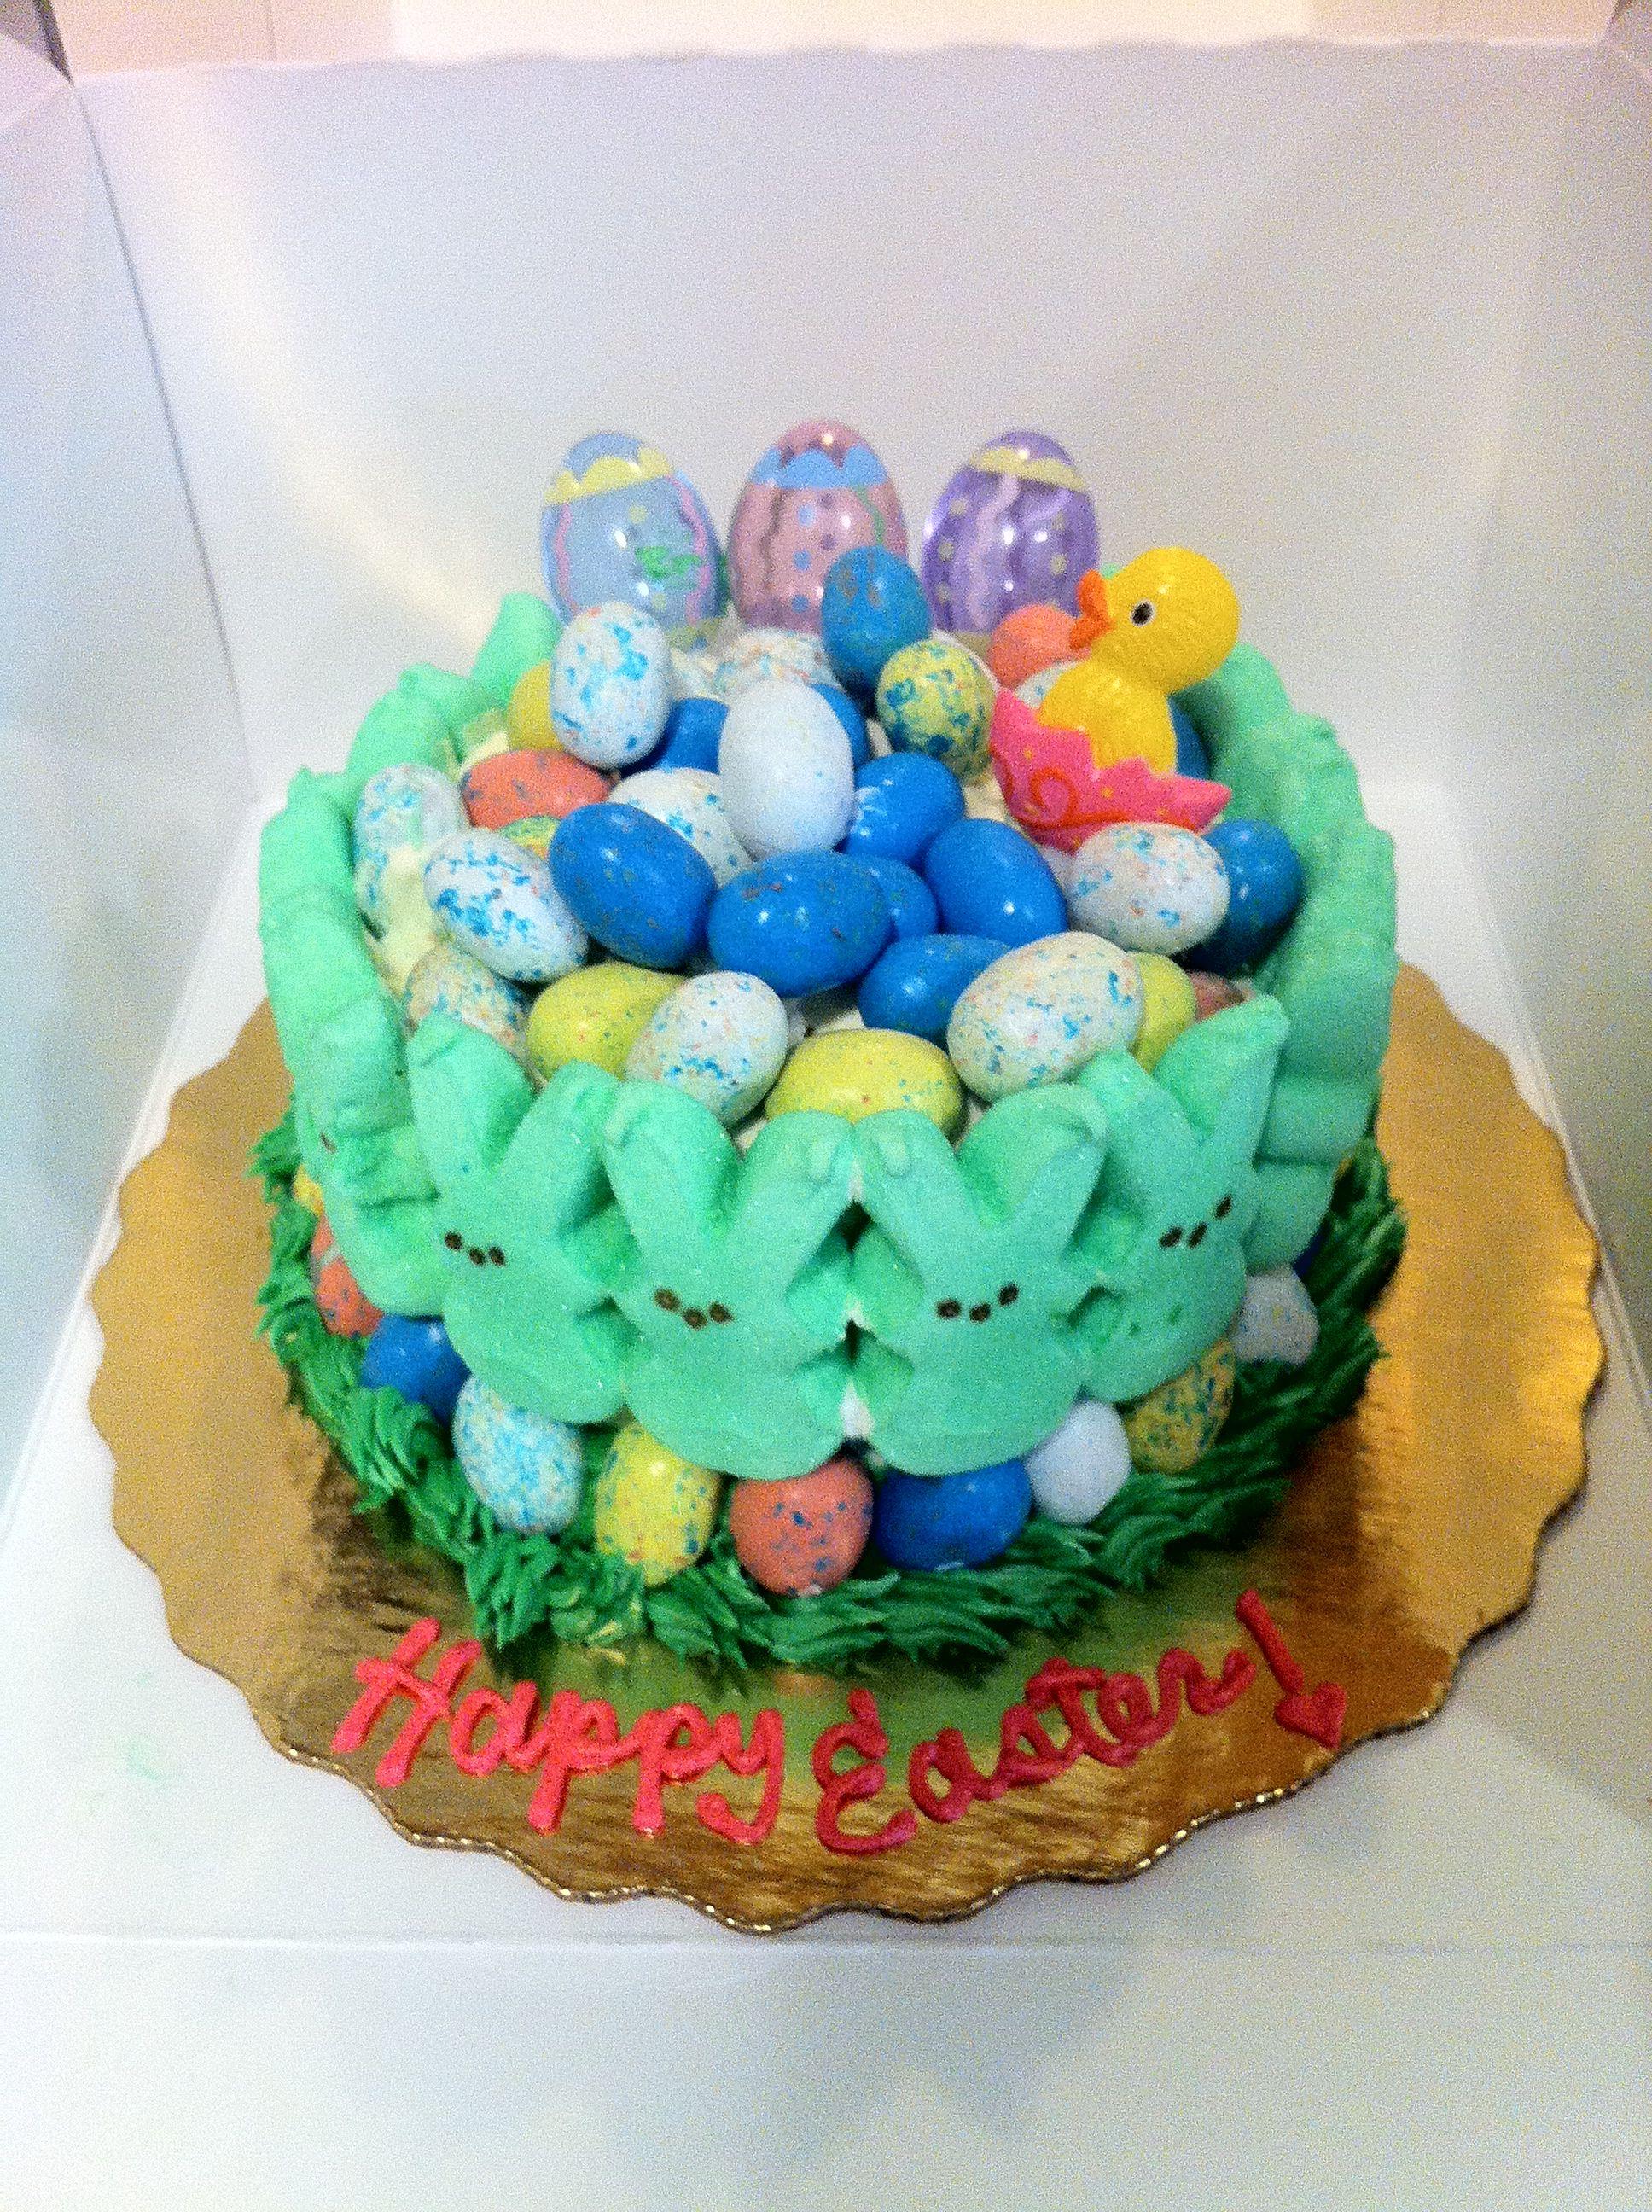 HAPPY EASTER CAKE Publix Cake